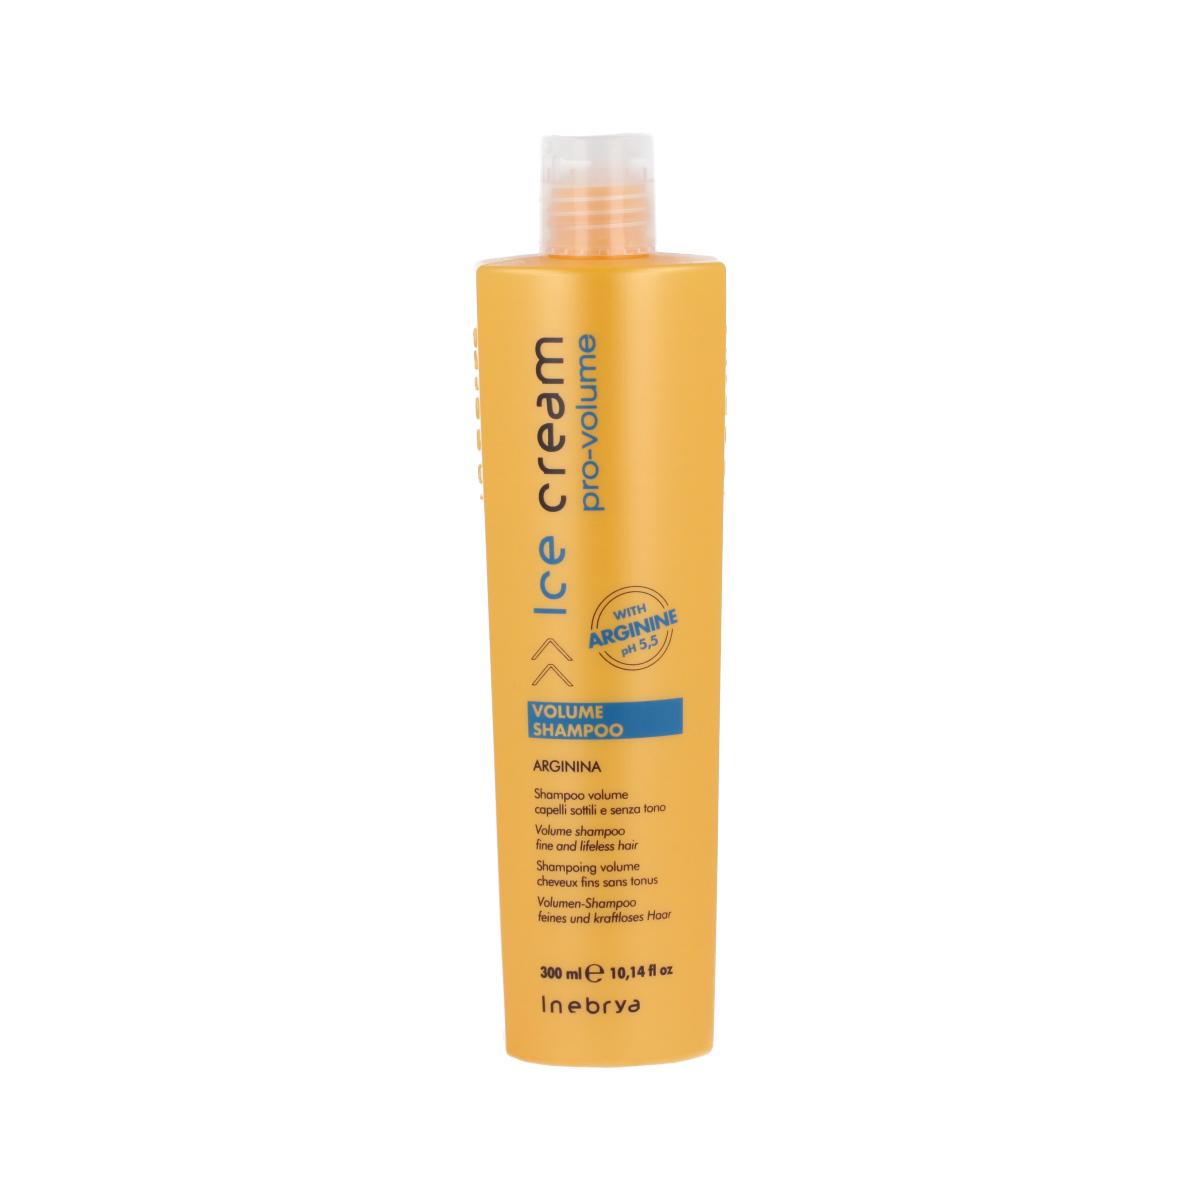 Inebrya Pro-Volume Shampoo 300 ml 94122